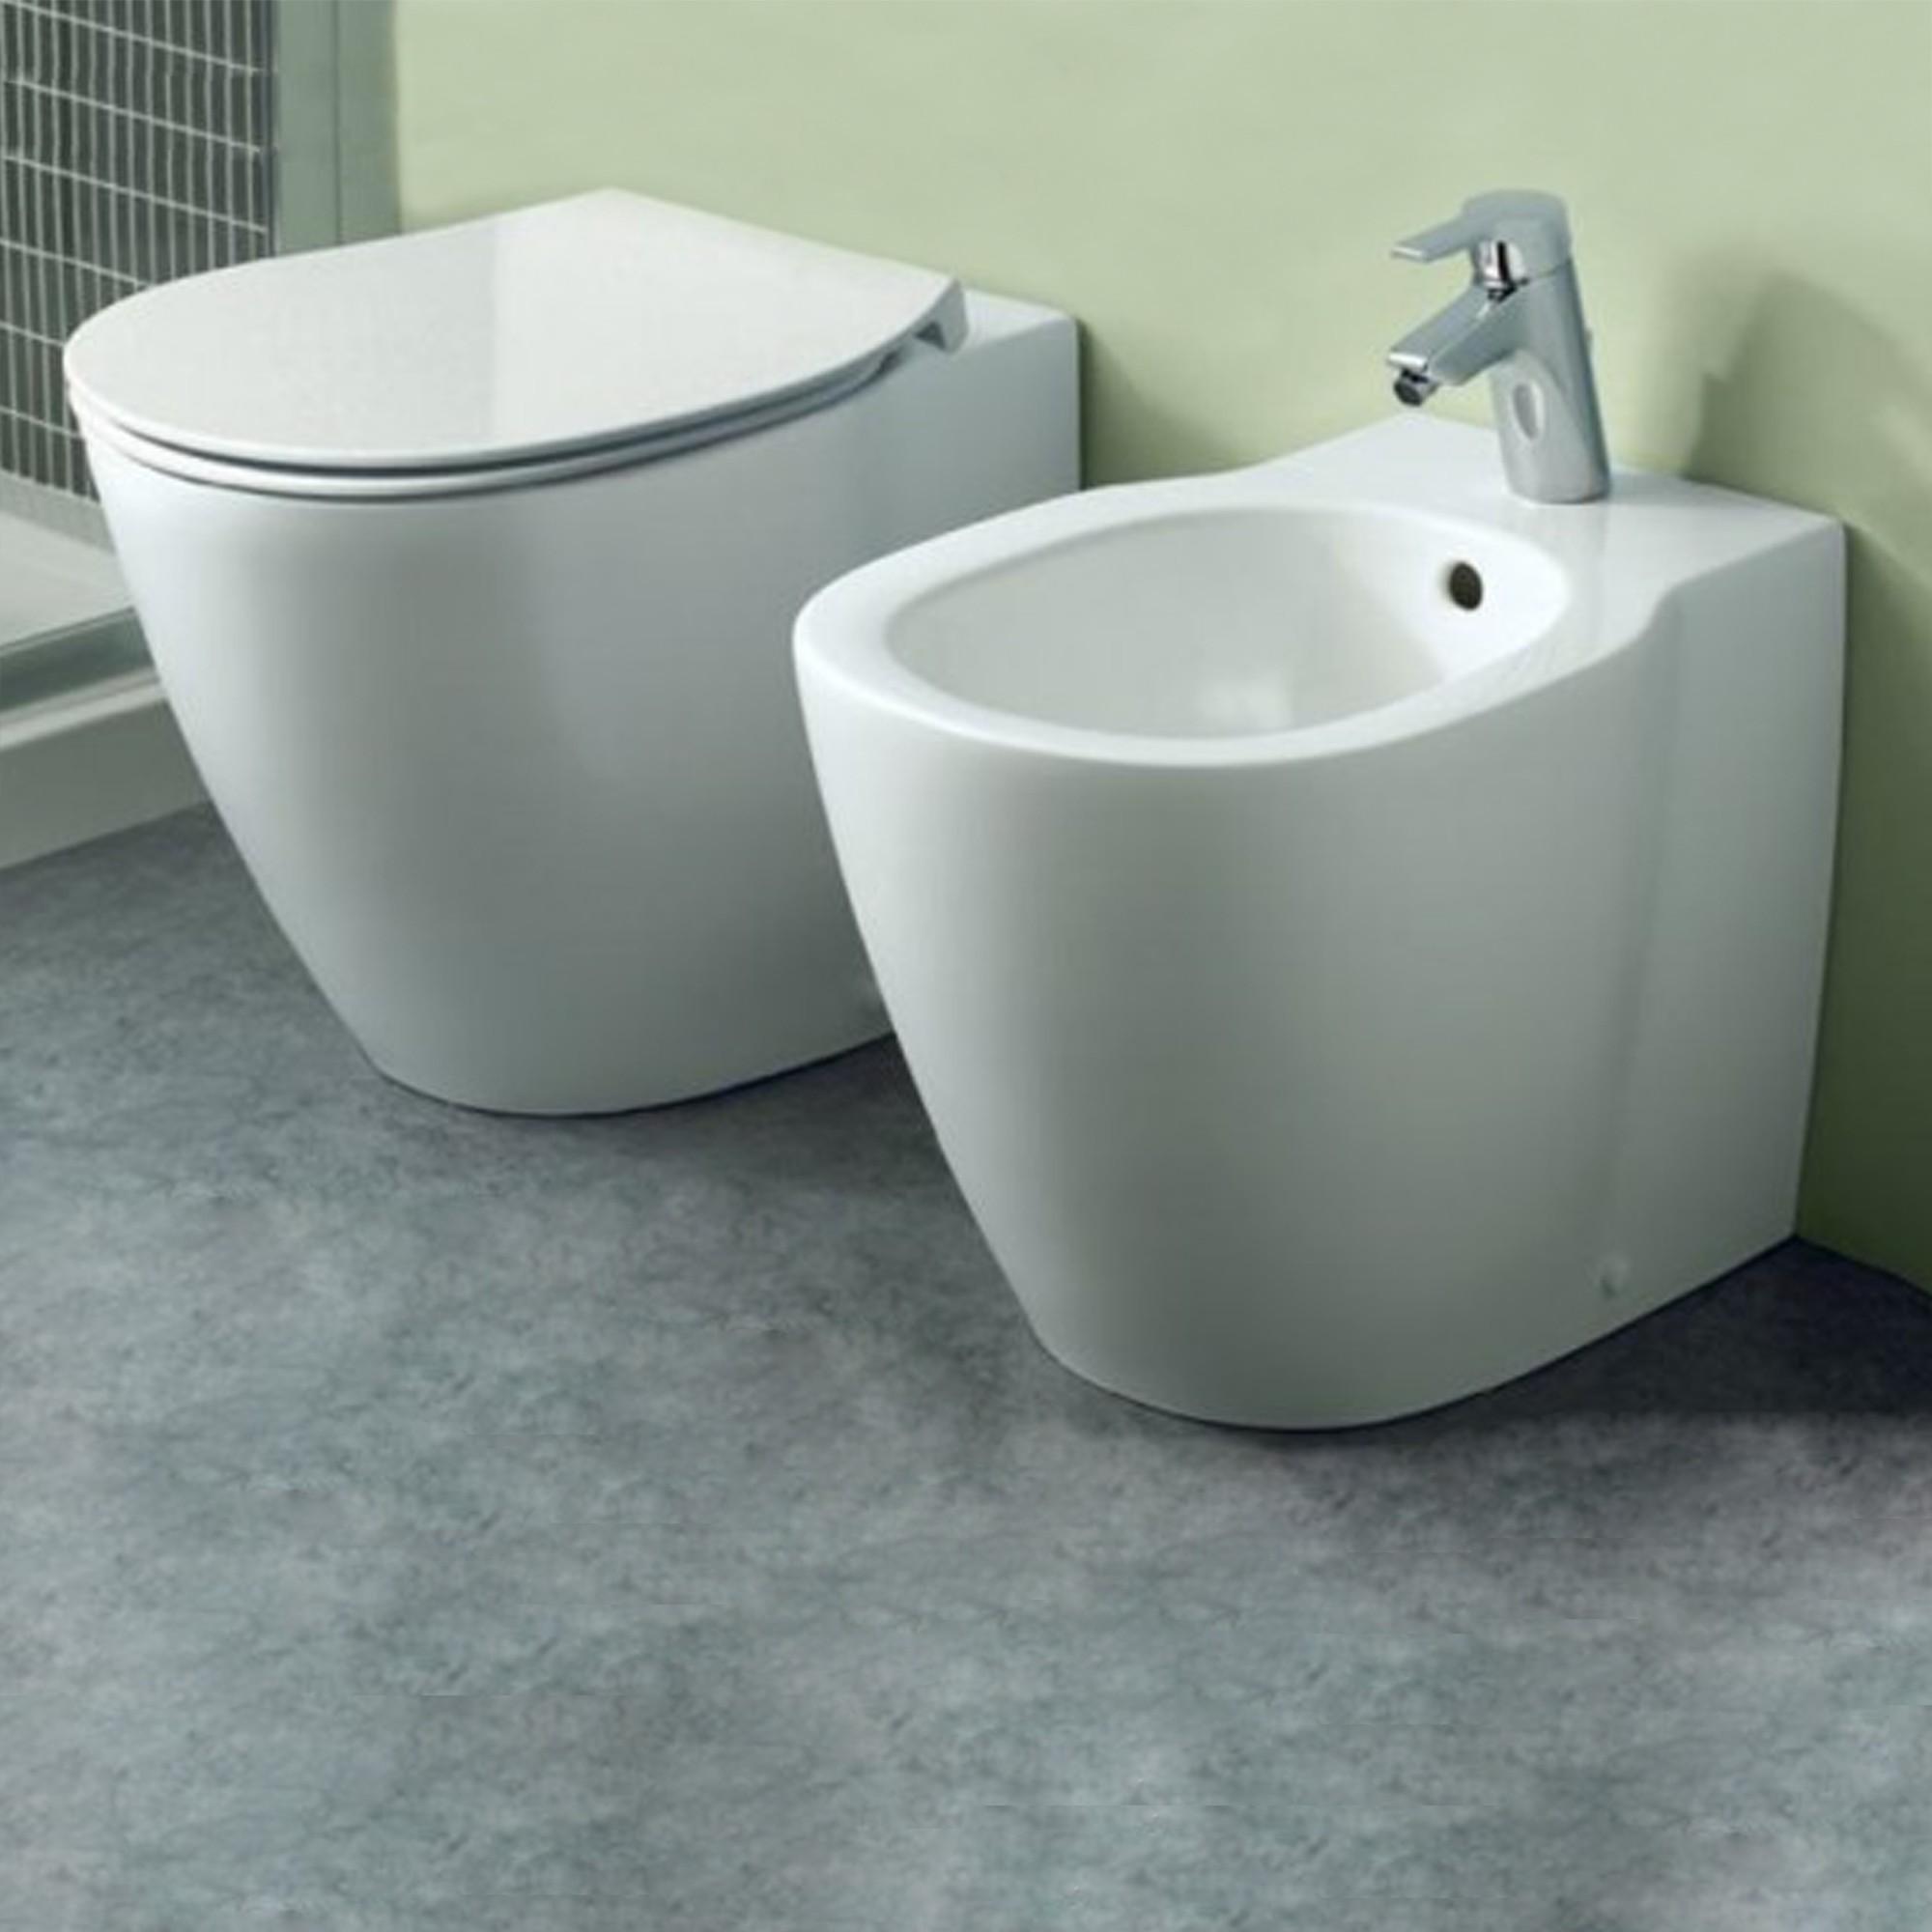 Accessori Sanitari Ideal Standard.Ideal Standard Sanitari Wc Aquablade Scarico Traslato E Bidet